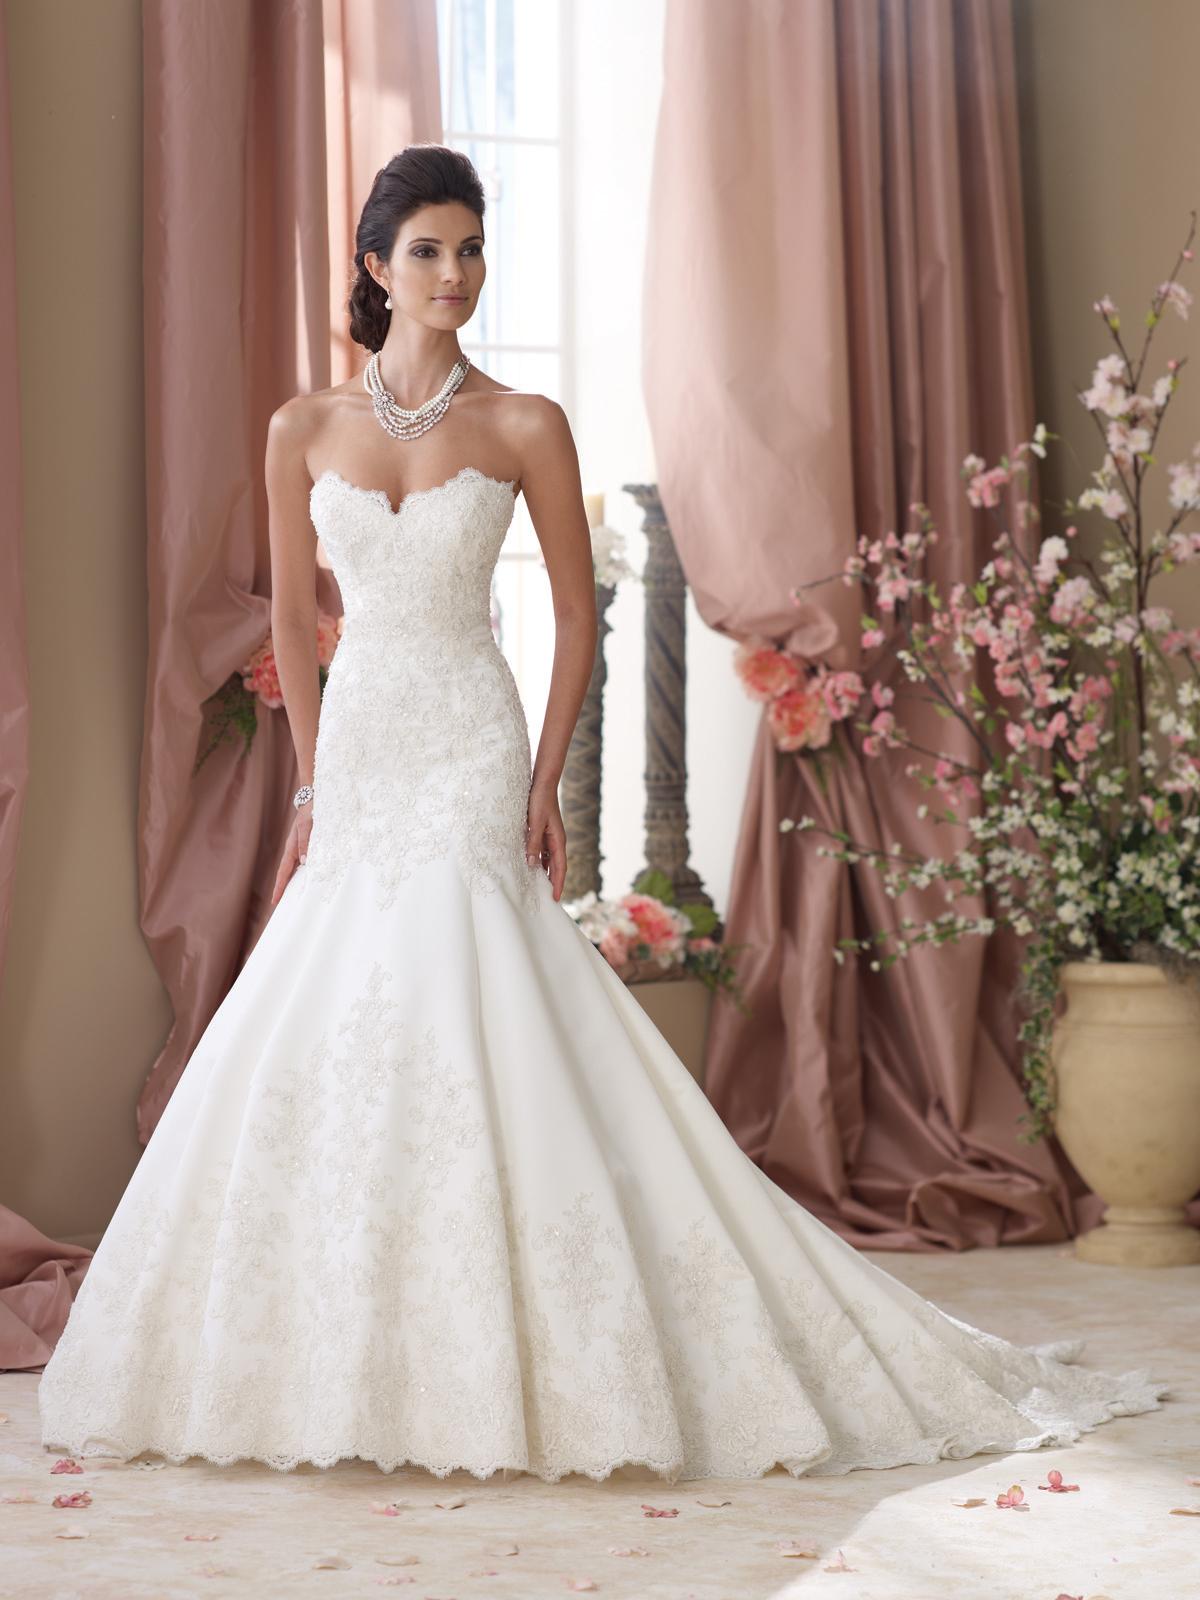 Wedding Dresses For   Sunshine Coast : Home mon cheri by david tutera may